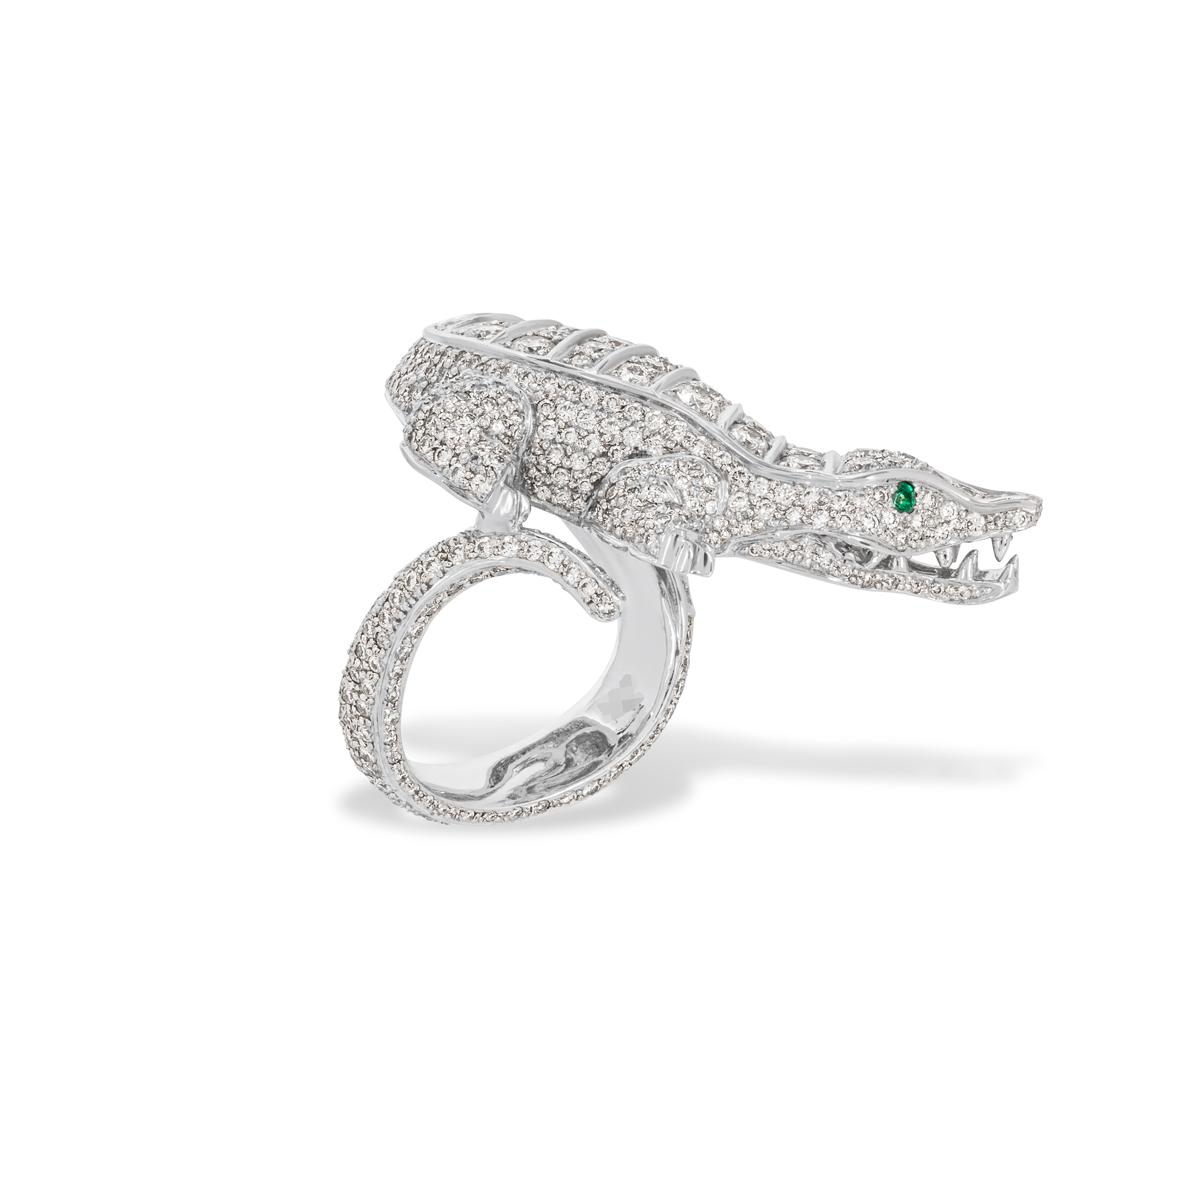 Diamond Set Alligator Dress Ring in Platinum 5.75ct